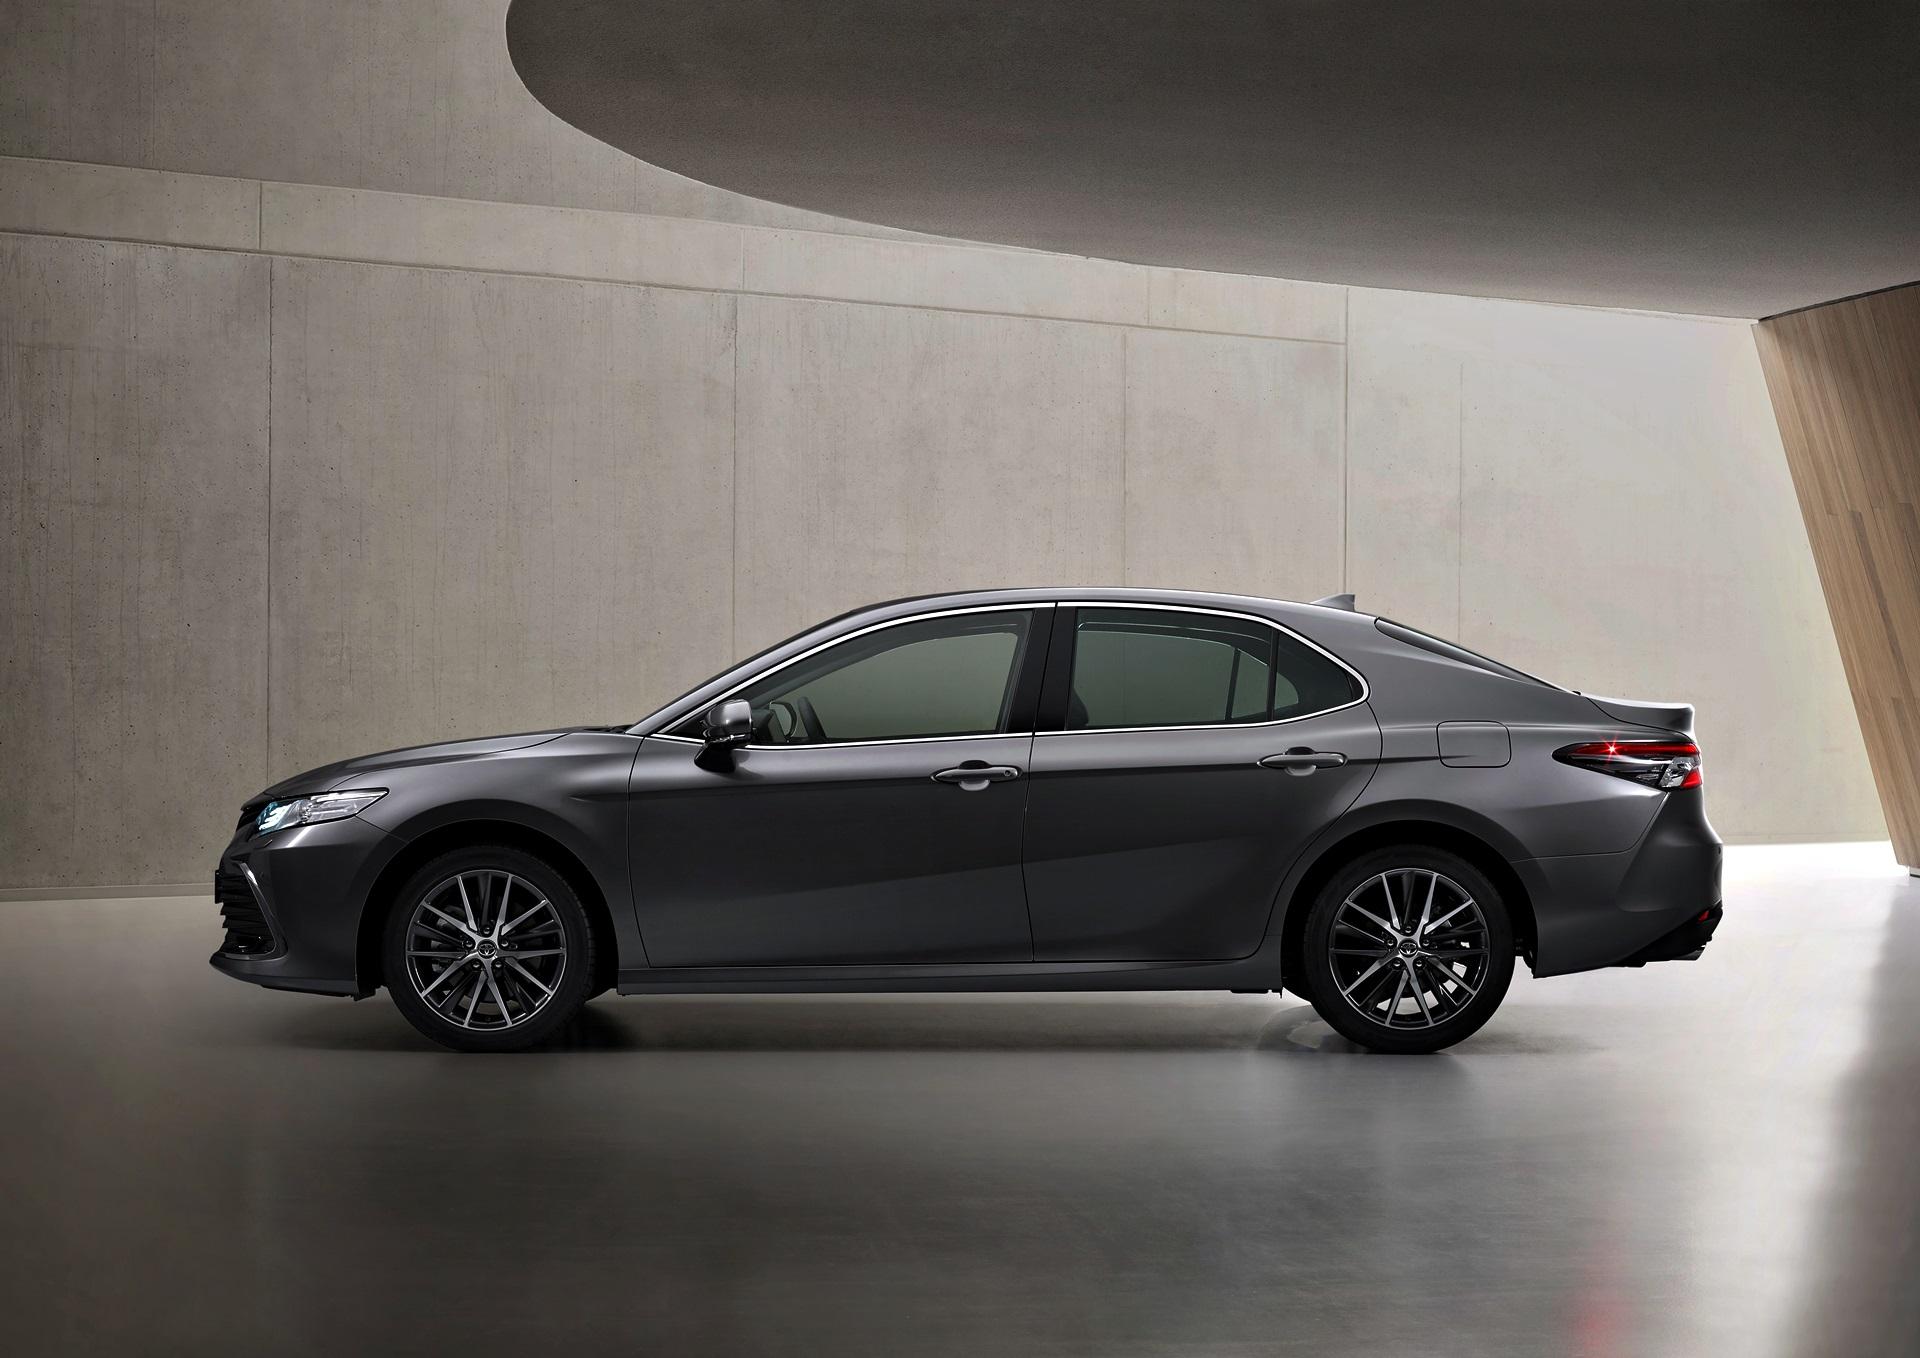 Nuevo Toyota Camry 2021 (3)